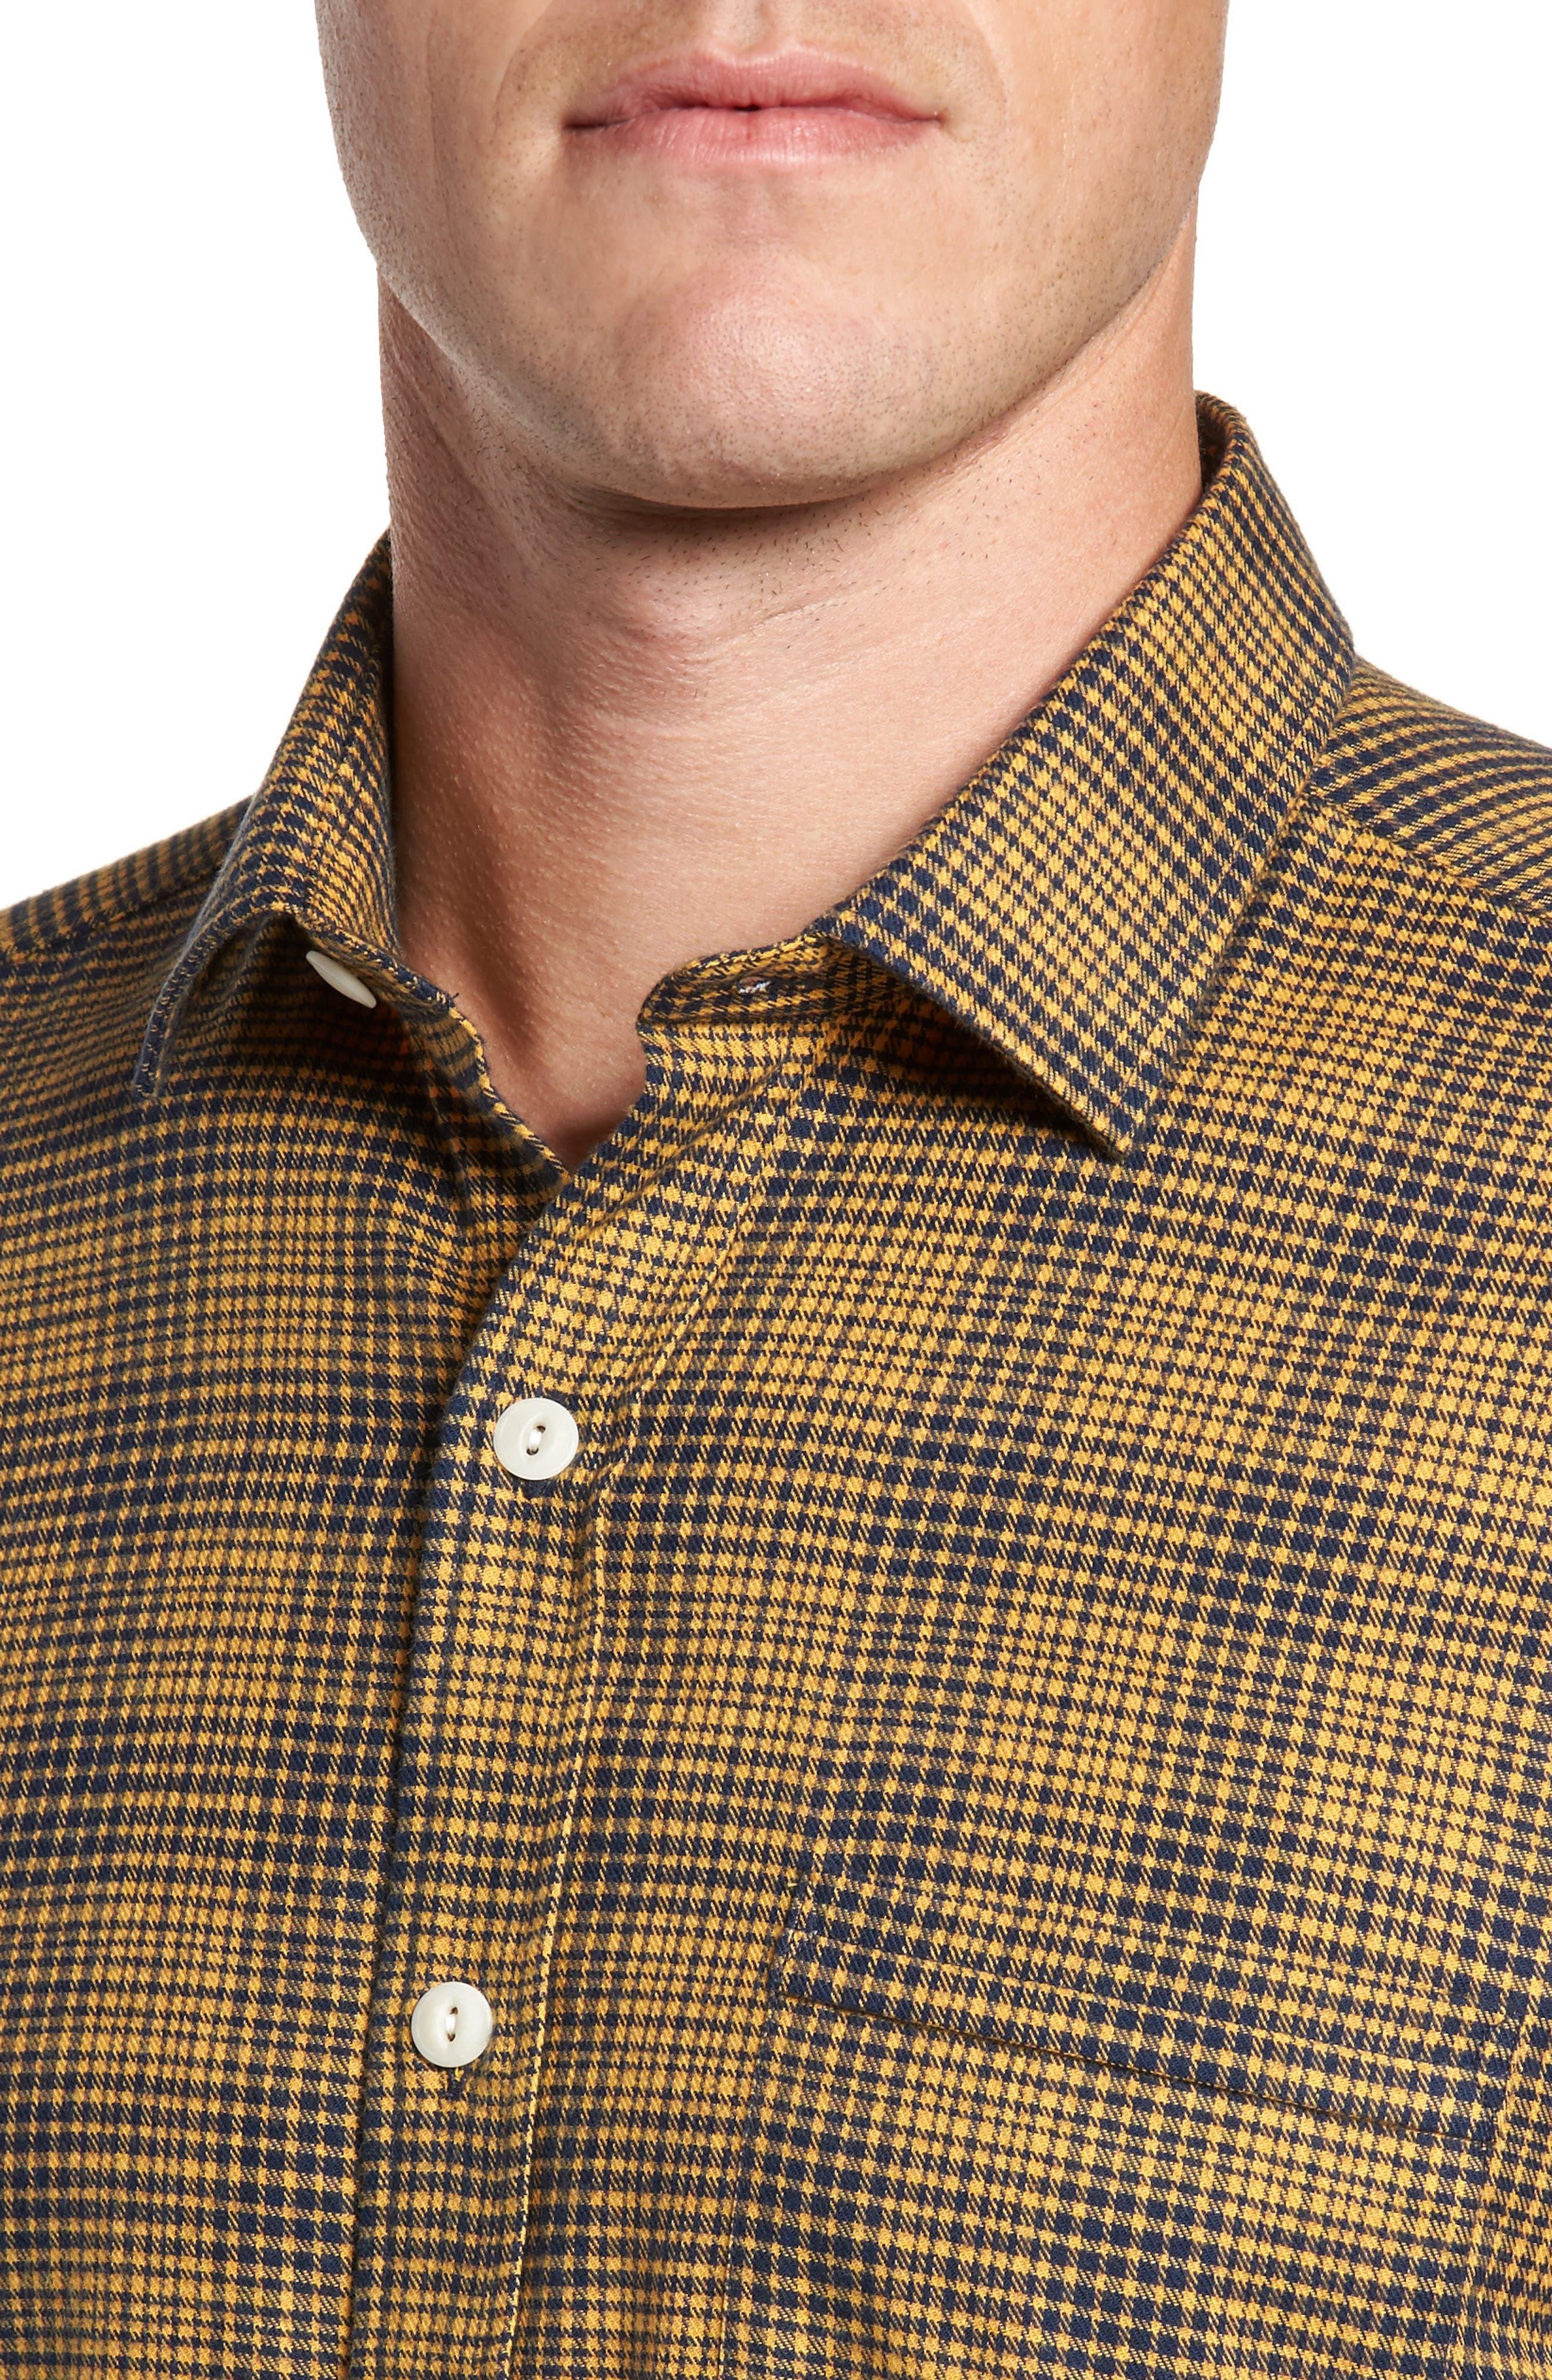 Glen Plaid Sport Shirt,                             Alternate thumbnail 4, color,                             700